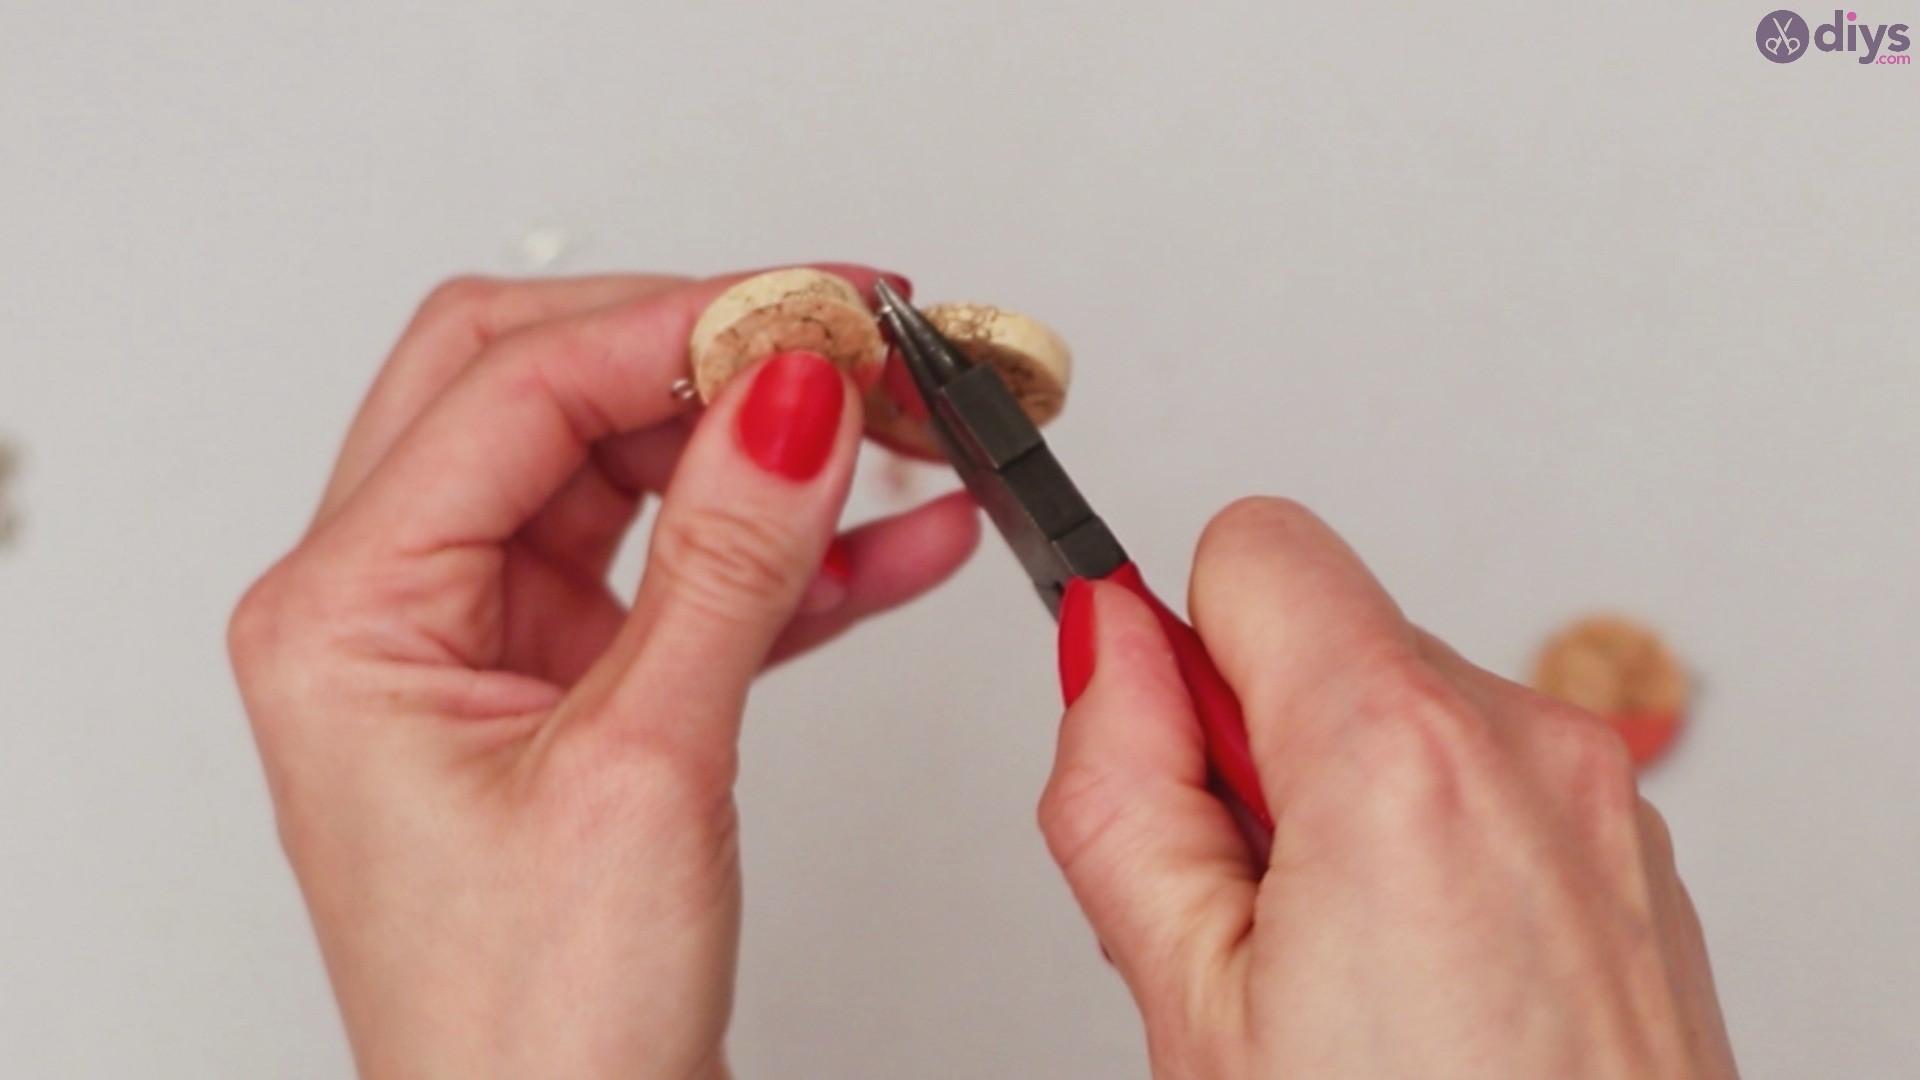 Diy wine cork necklace (36)